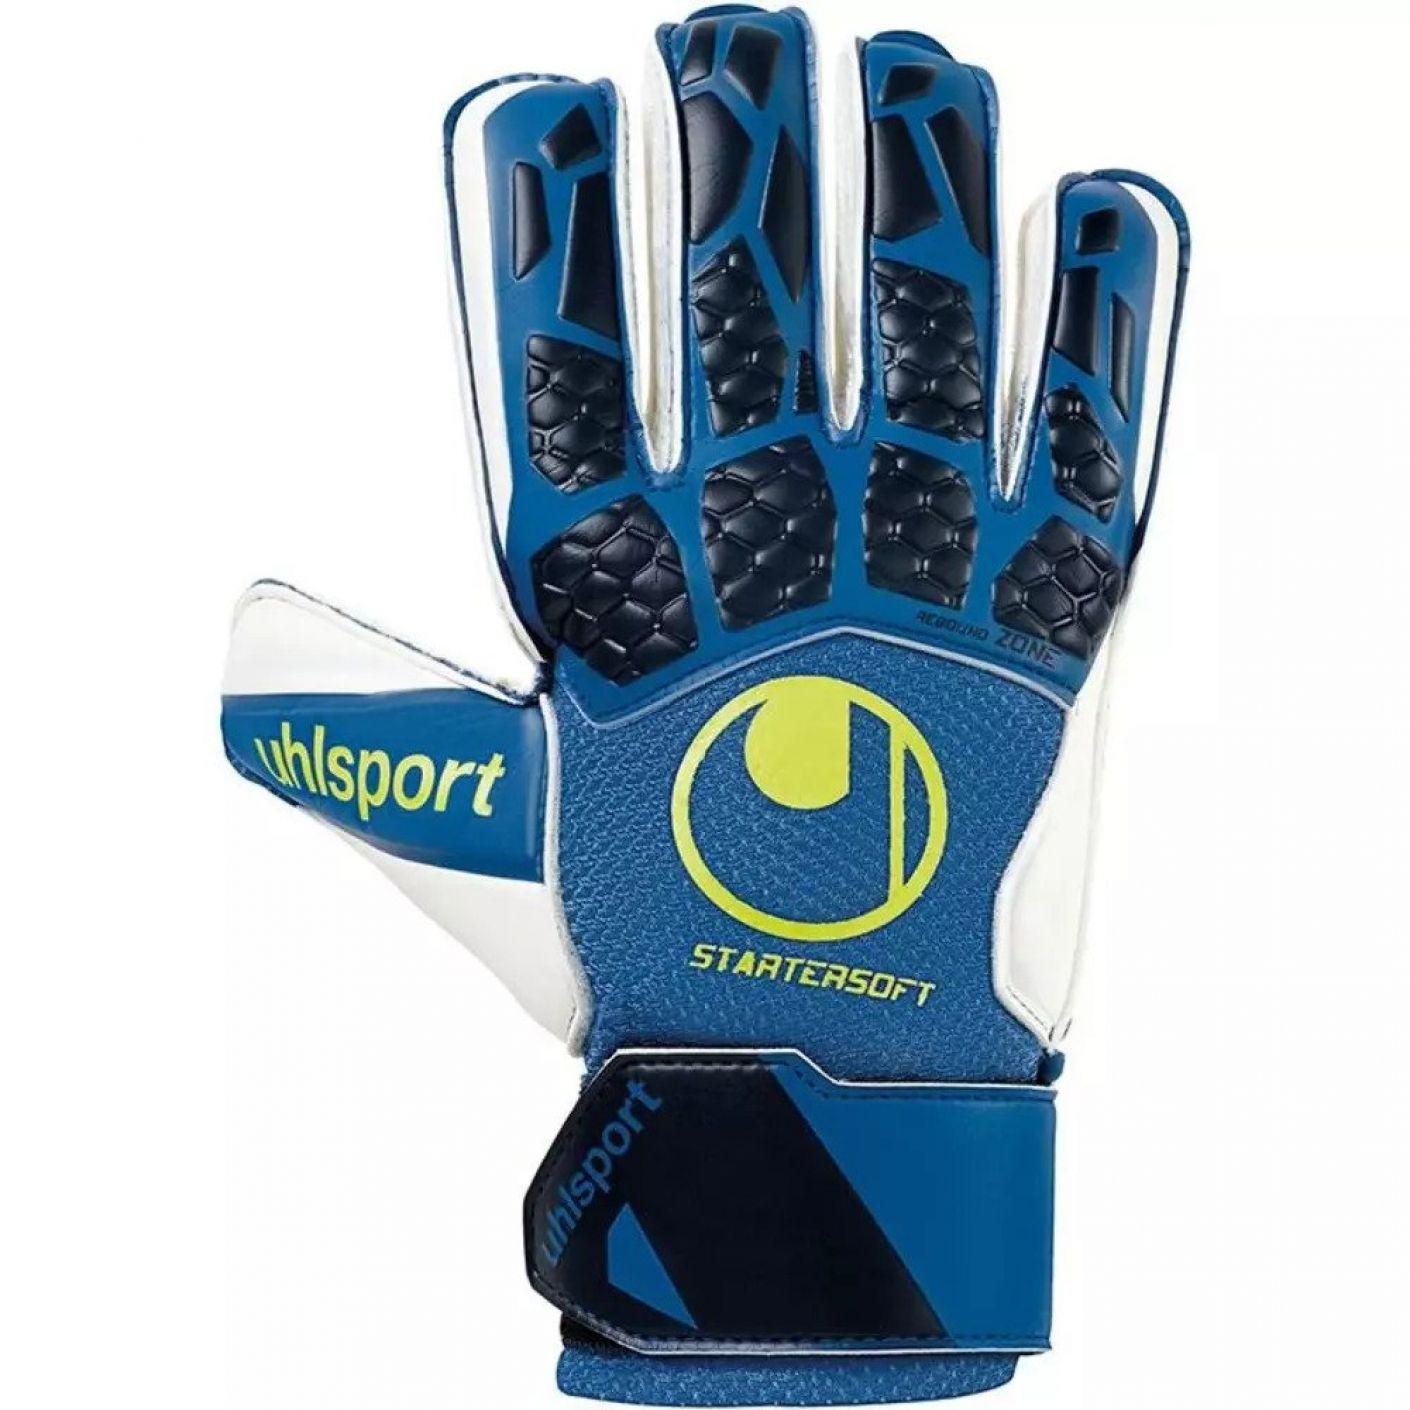 Uhlsport HYPERACT STARTER SOFT Keepershandschoenen Blauw Wit Geel